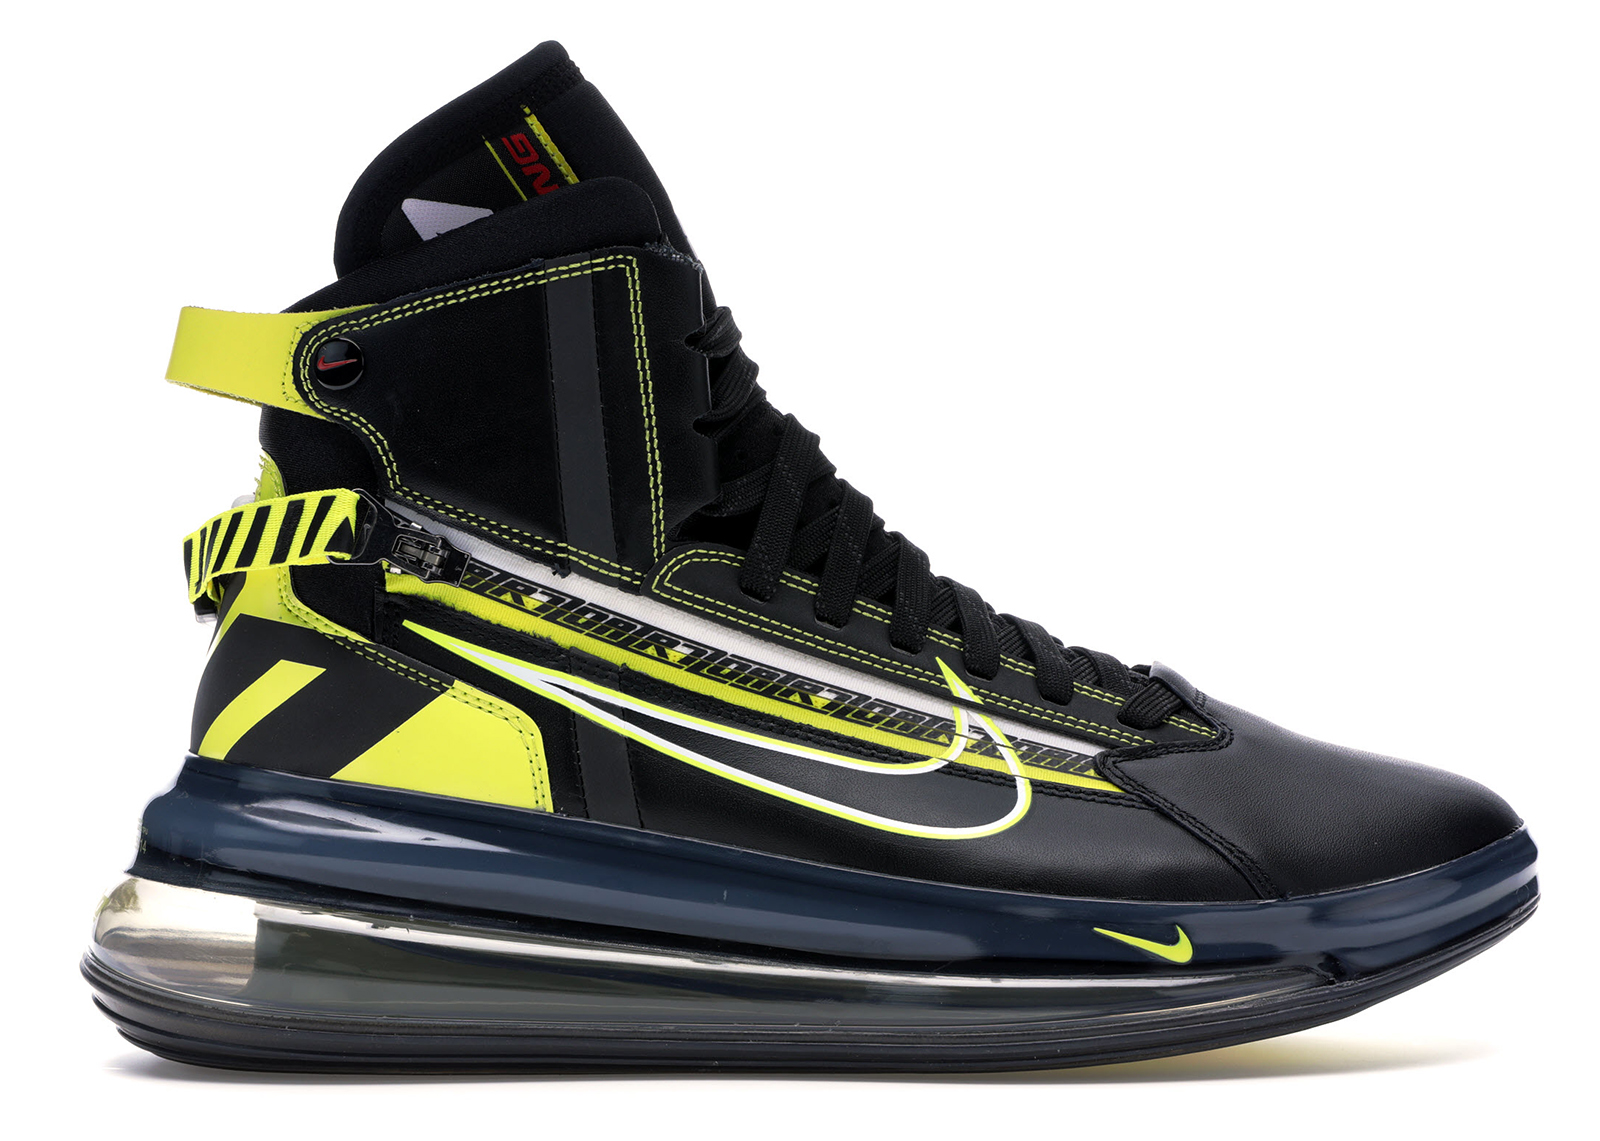 Nike Air Max 720 All Black Shoes |